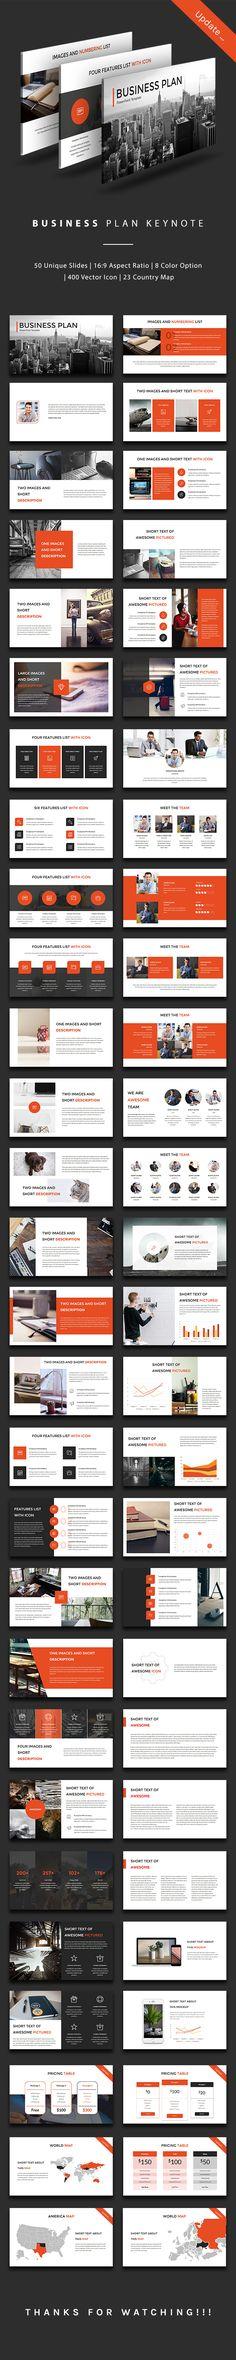 Business Plan Keynote Design Template - Business Keynote Design Template. Download here: https://graphicriver.net/item/business-plan-keynote/19398313?ref=yinkira